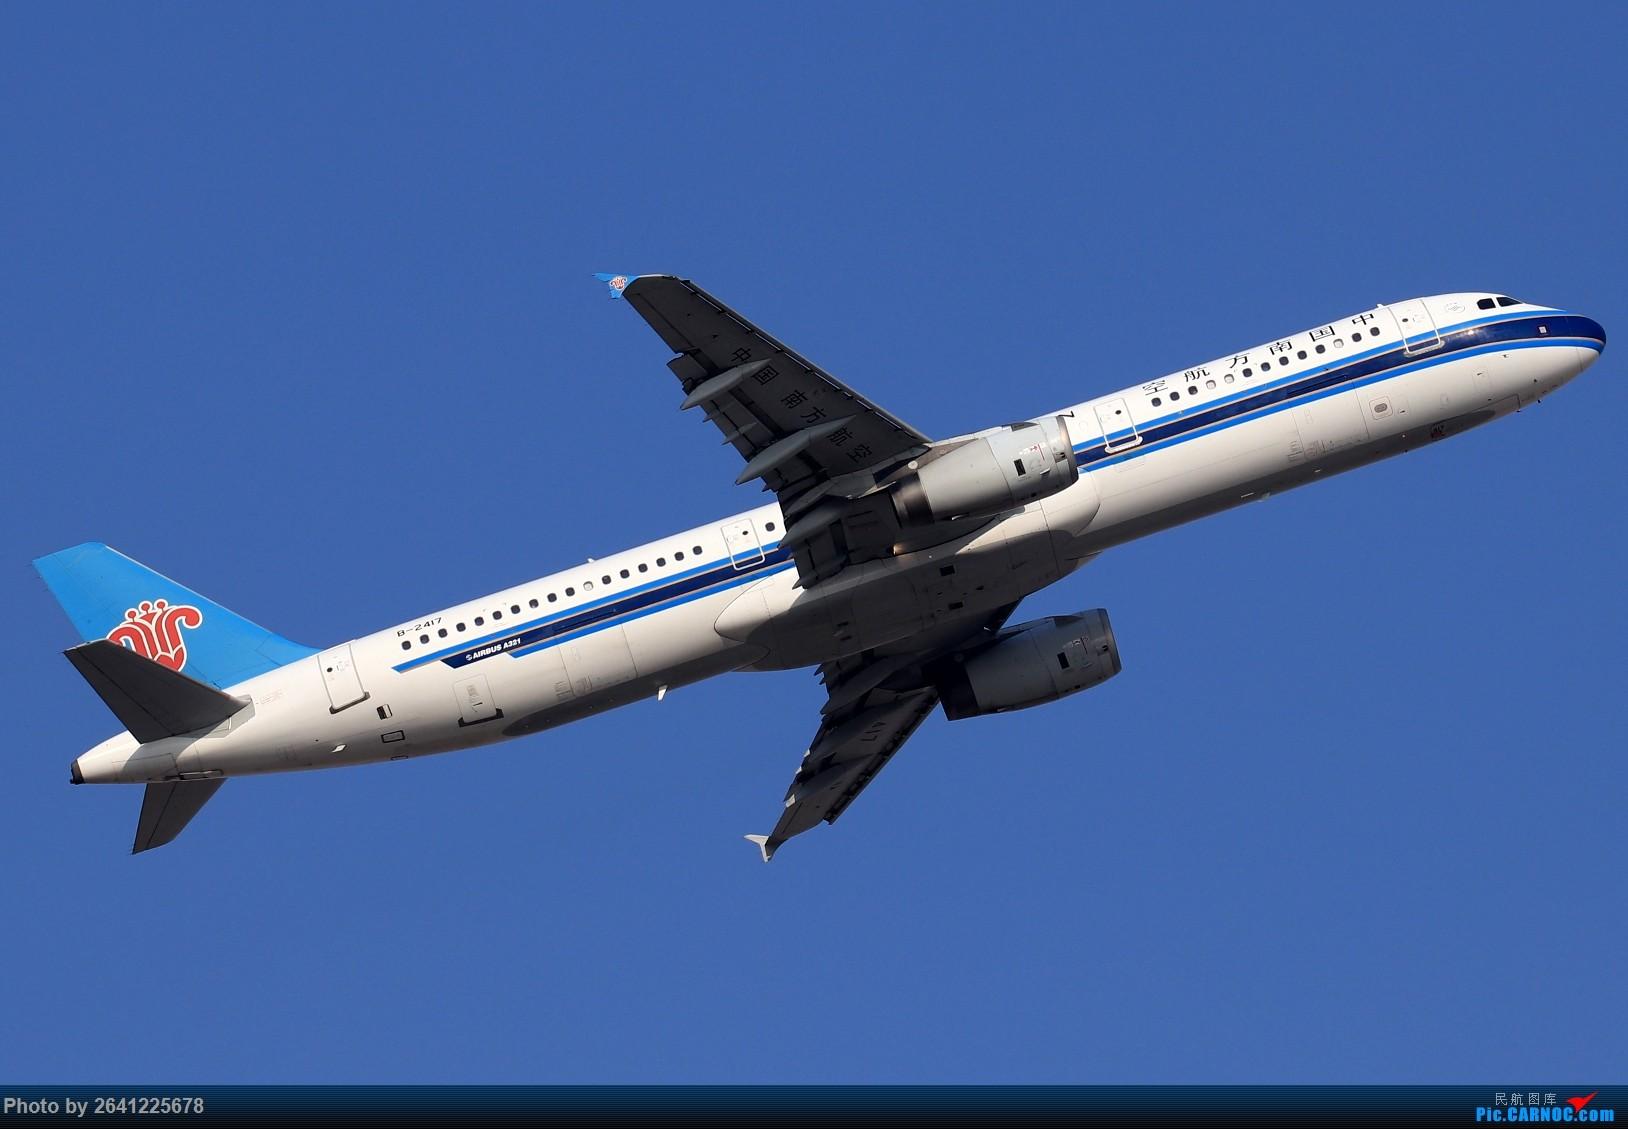 Re:[原创]【TSN】天津滨海国际机场半日游(按注册号1~9发图) AIRBUS A321-200 B-2417 中国天津滨海国际机场